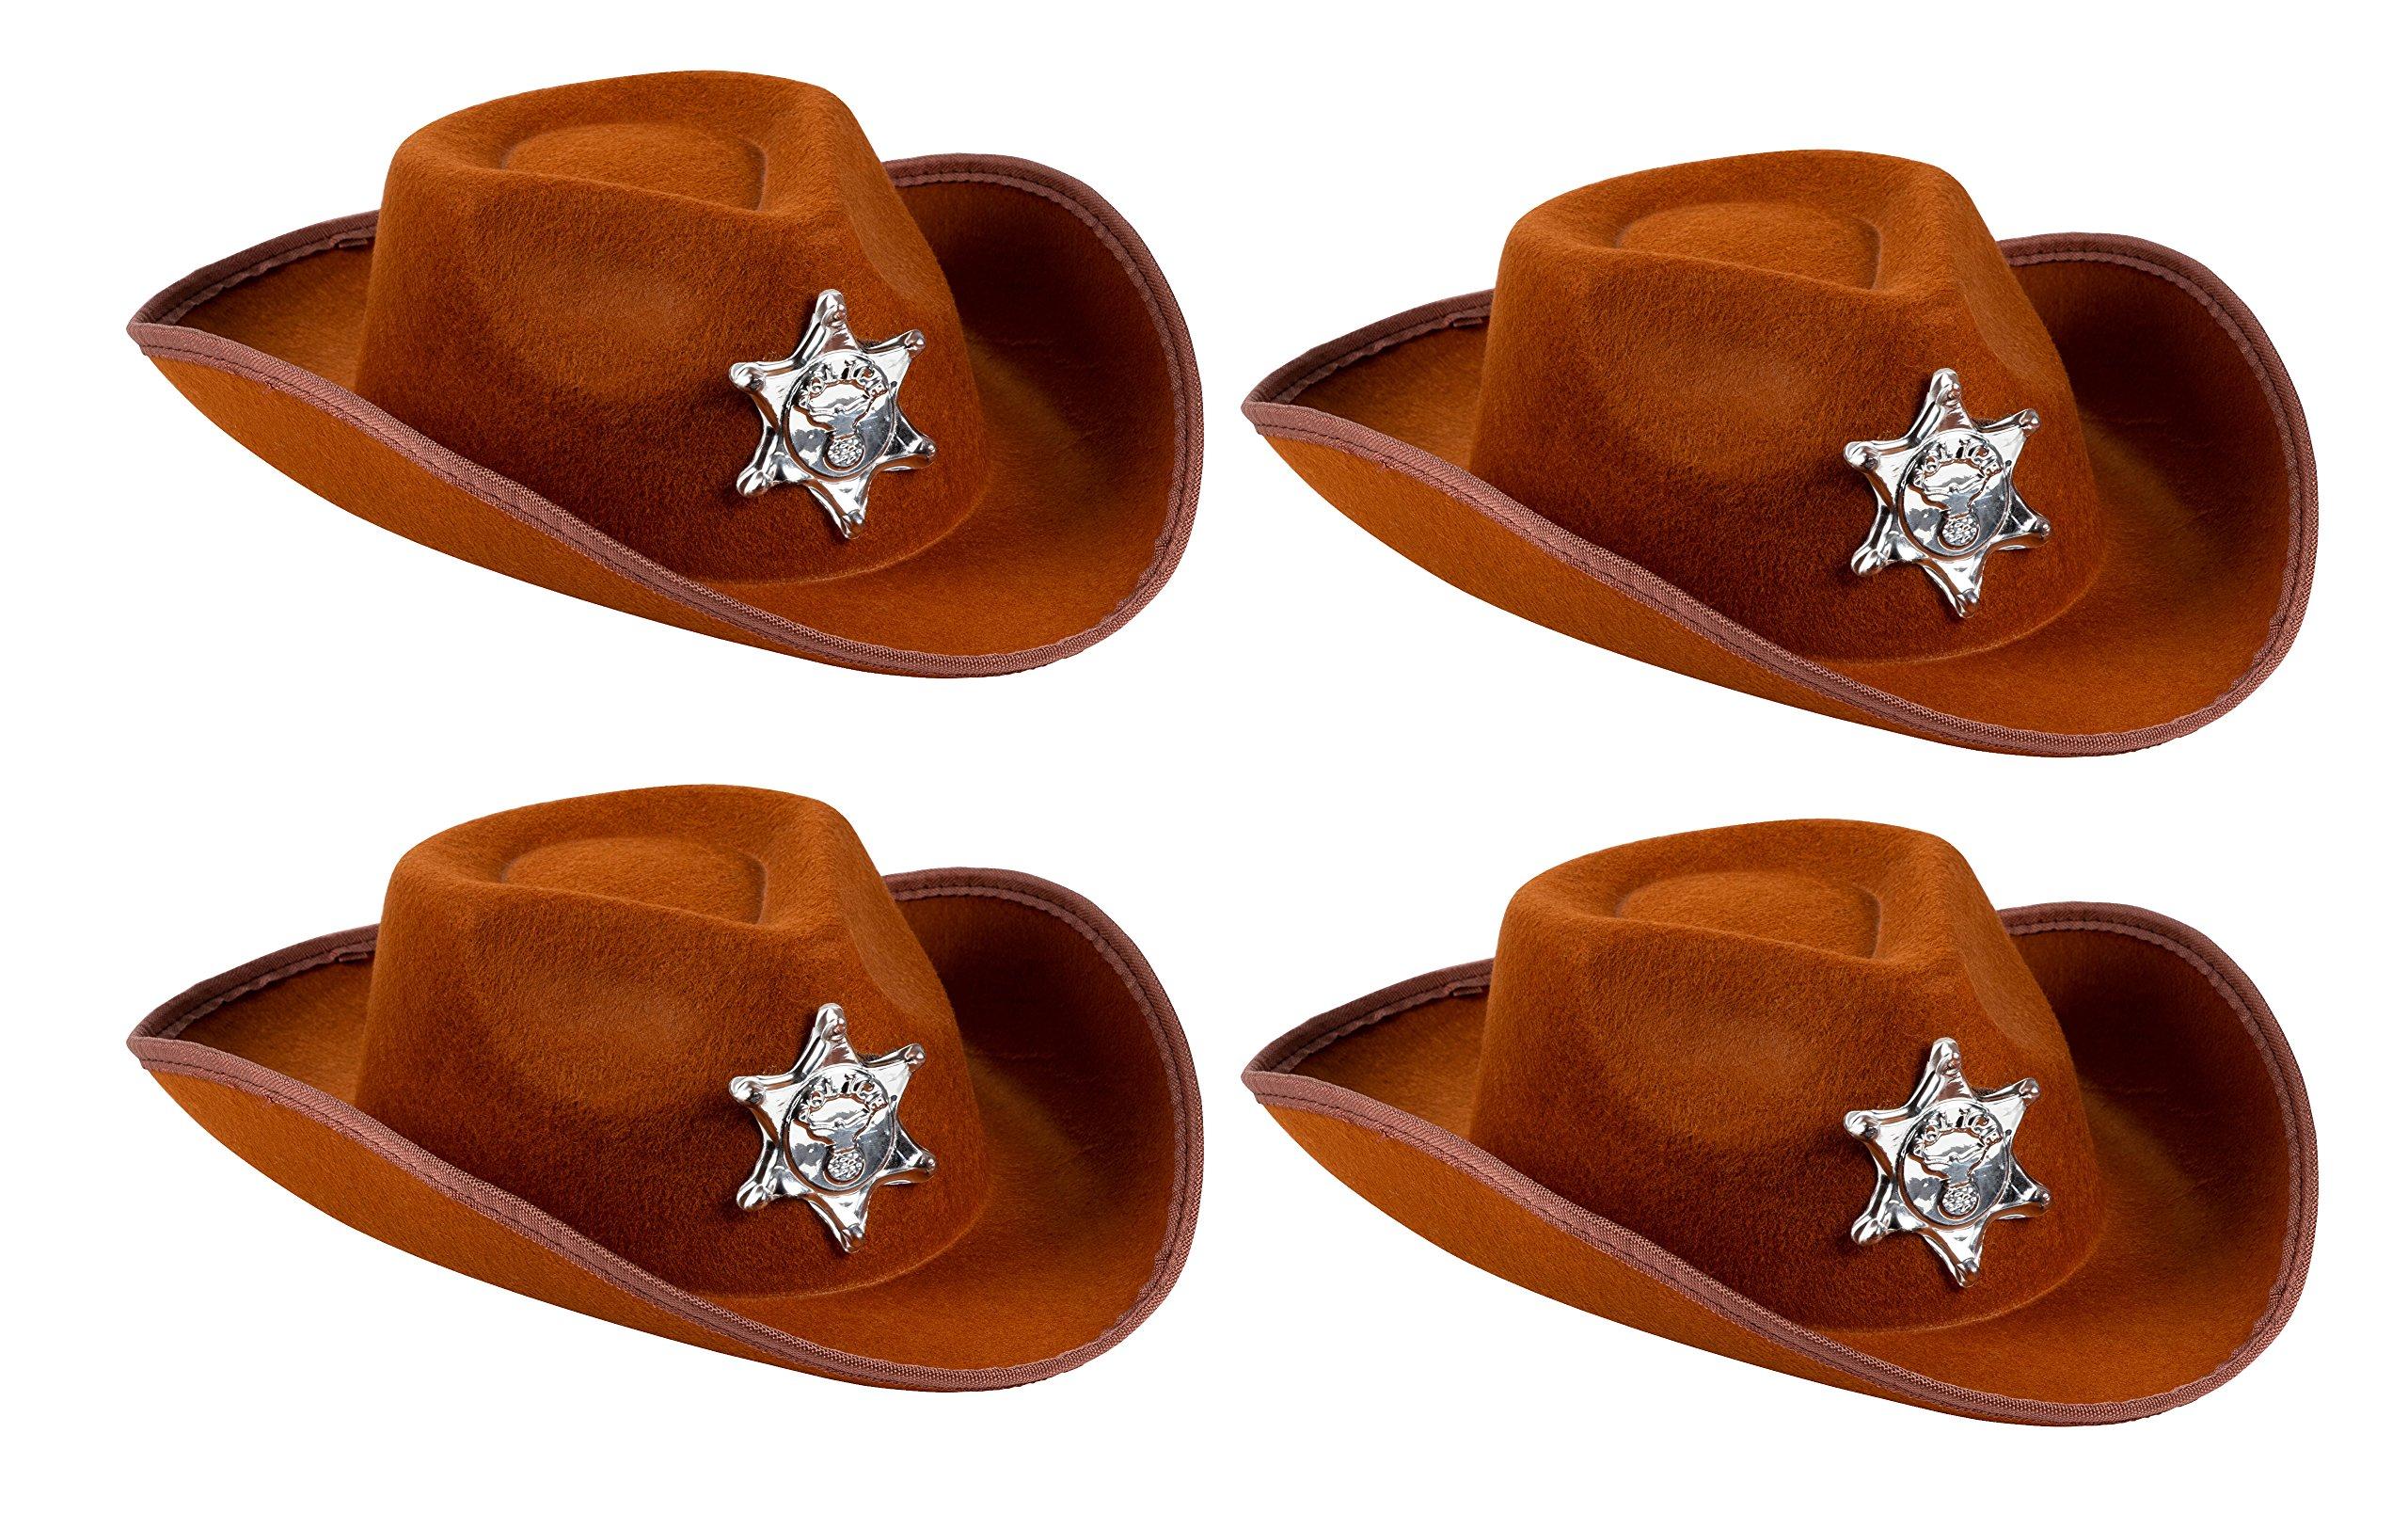 Cowboy Sheriff's Hat Kids - 4-Pack Novelty Children Cowboy Western Hats Badge Birthdays, Party Favors, Brown